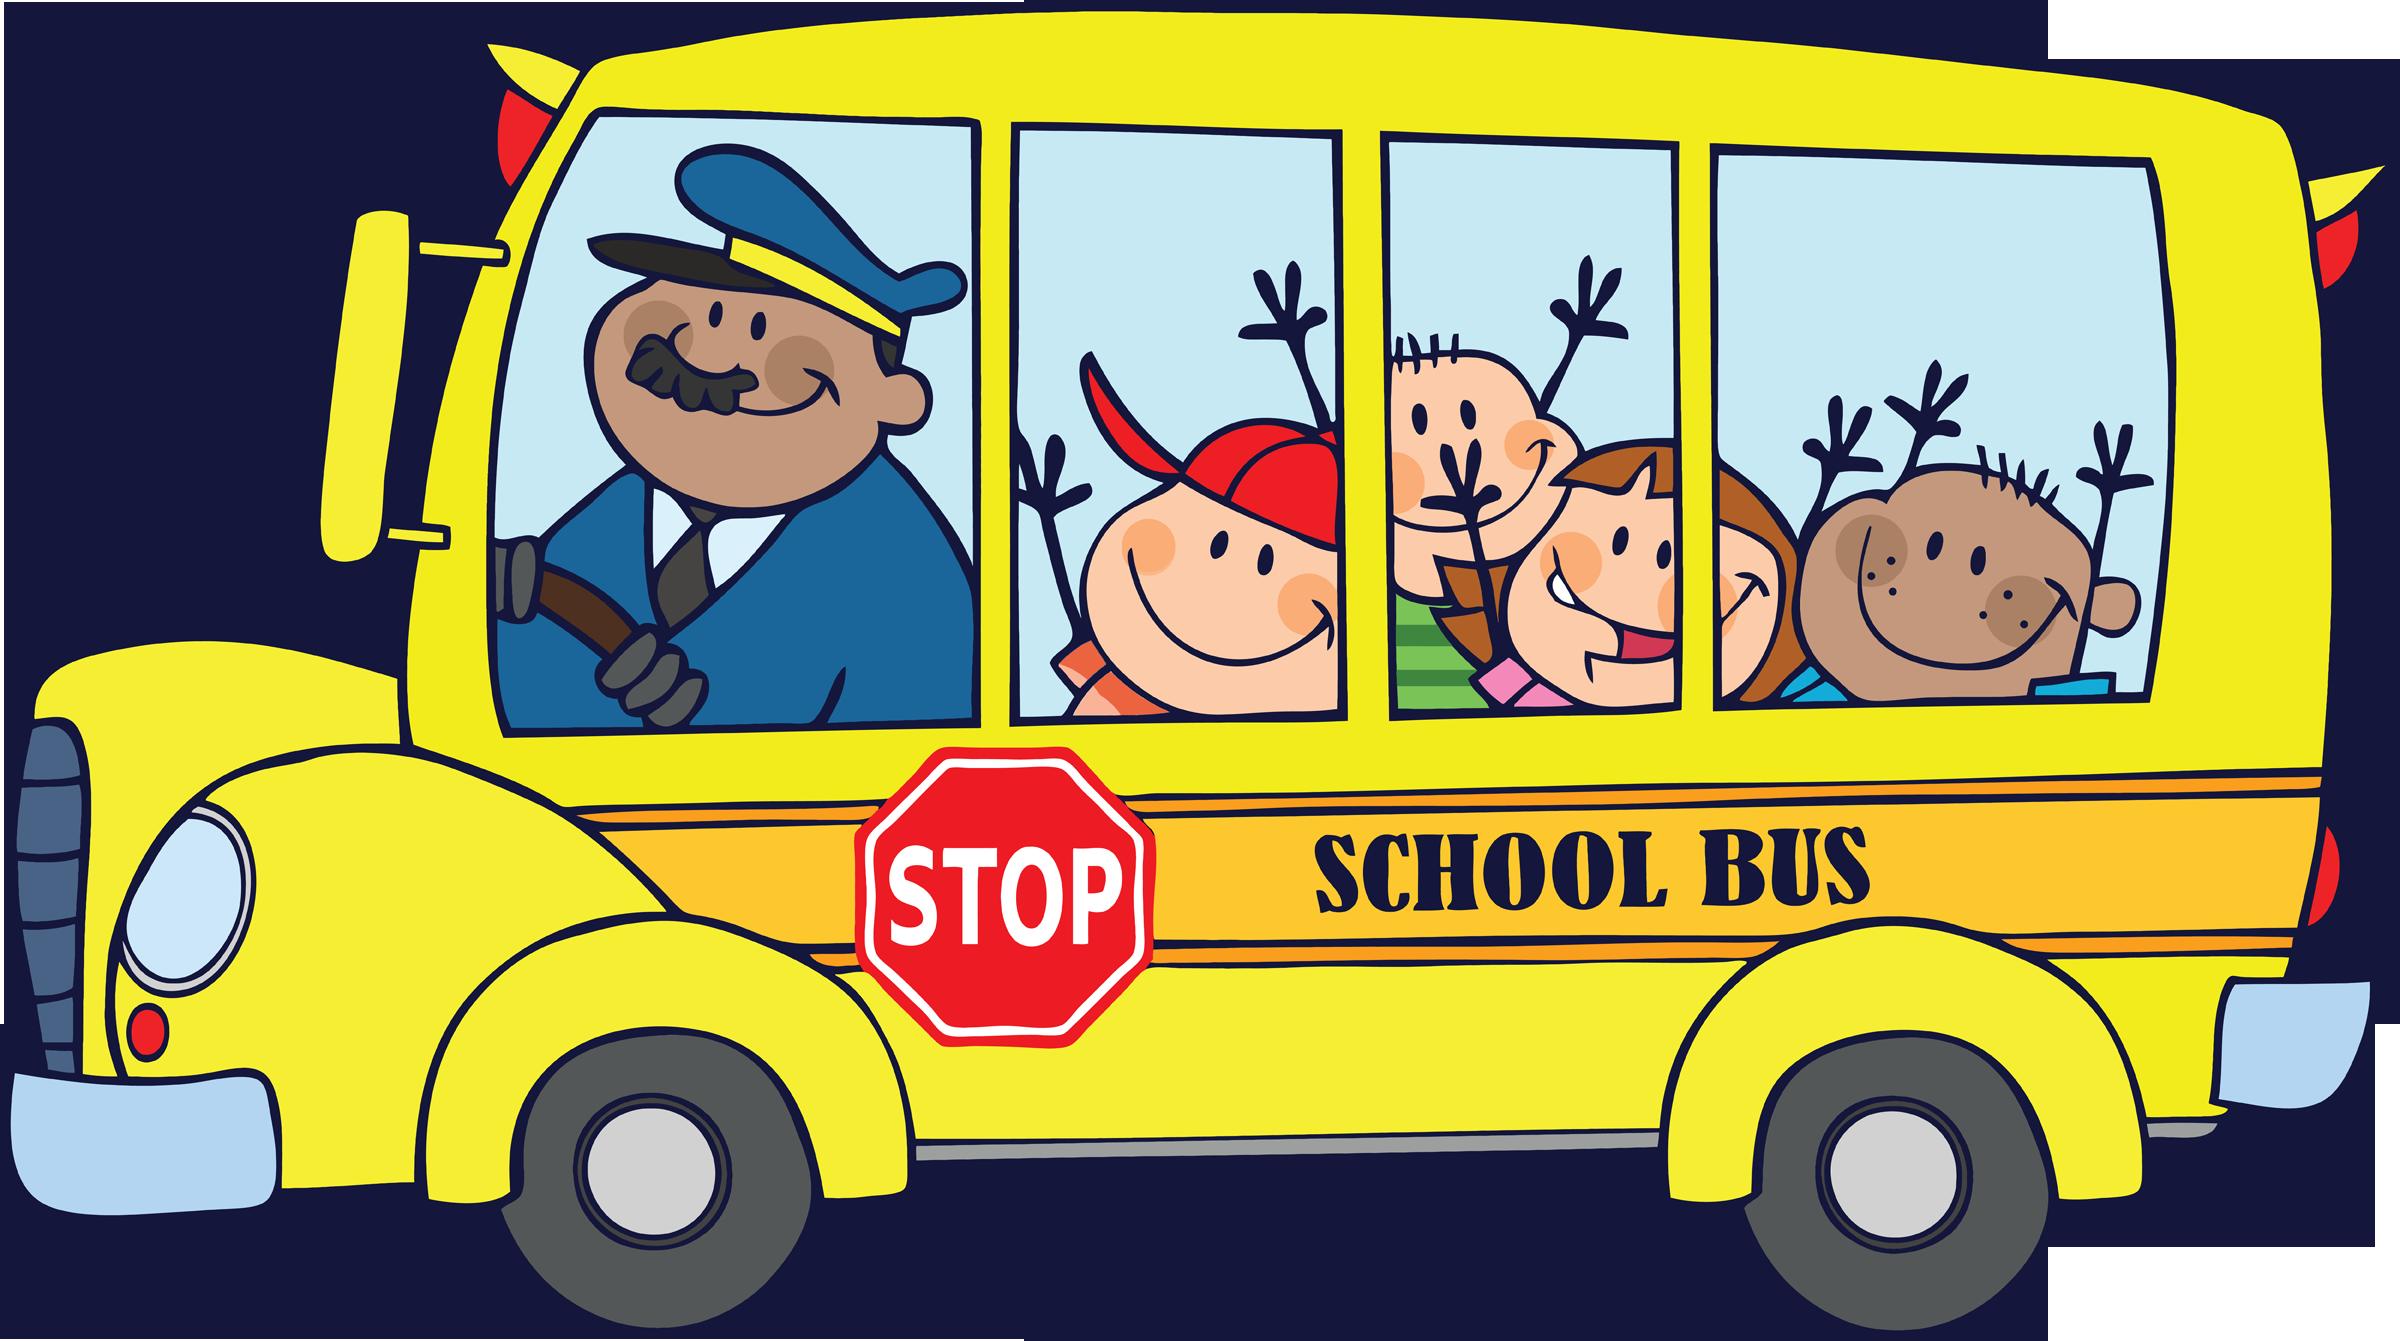 School dismissal clipart.